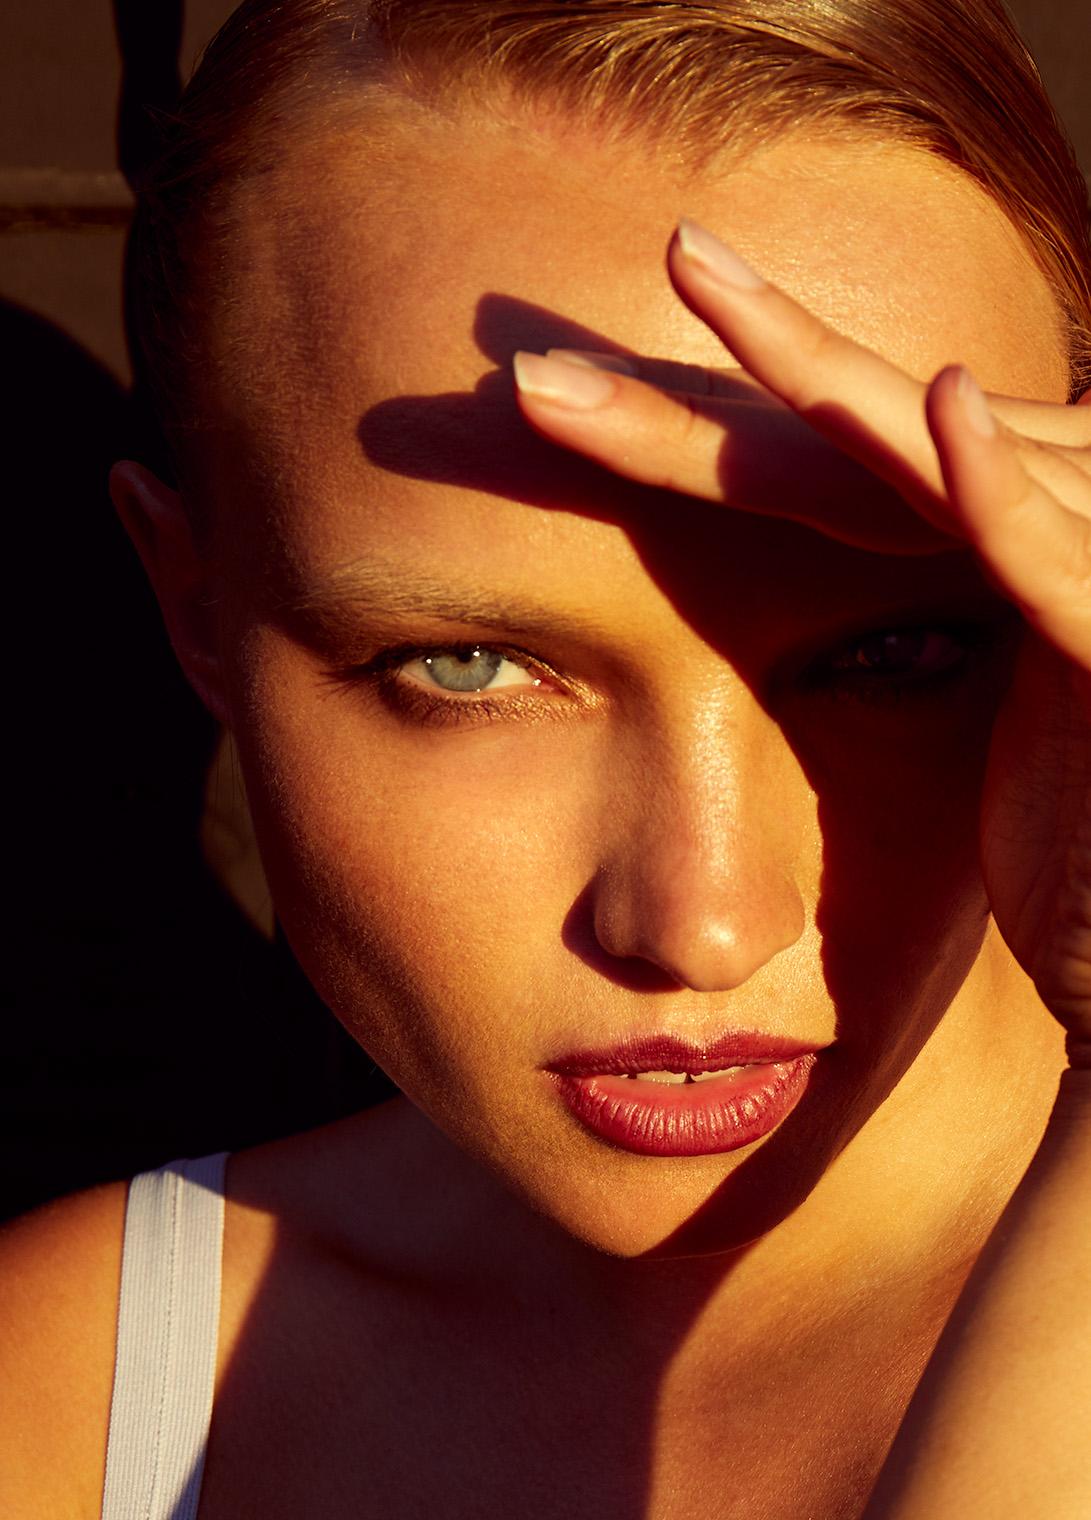 girl with magic eyes closeup portrait in California sunlight